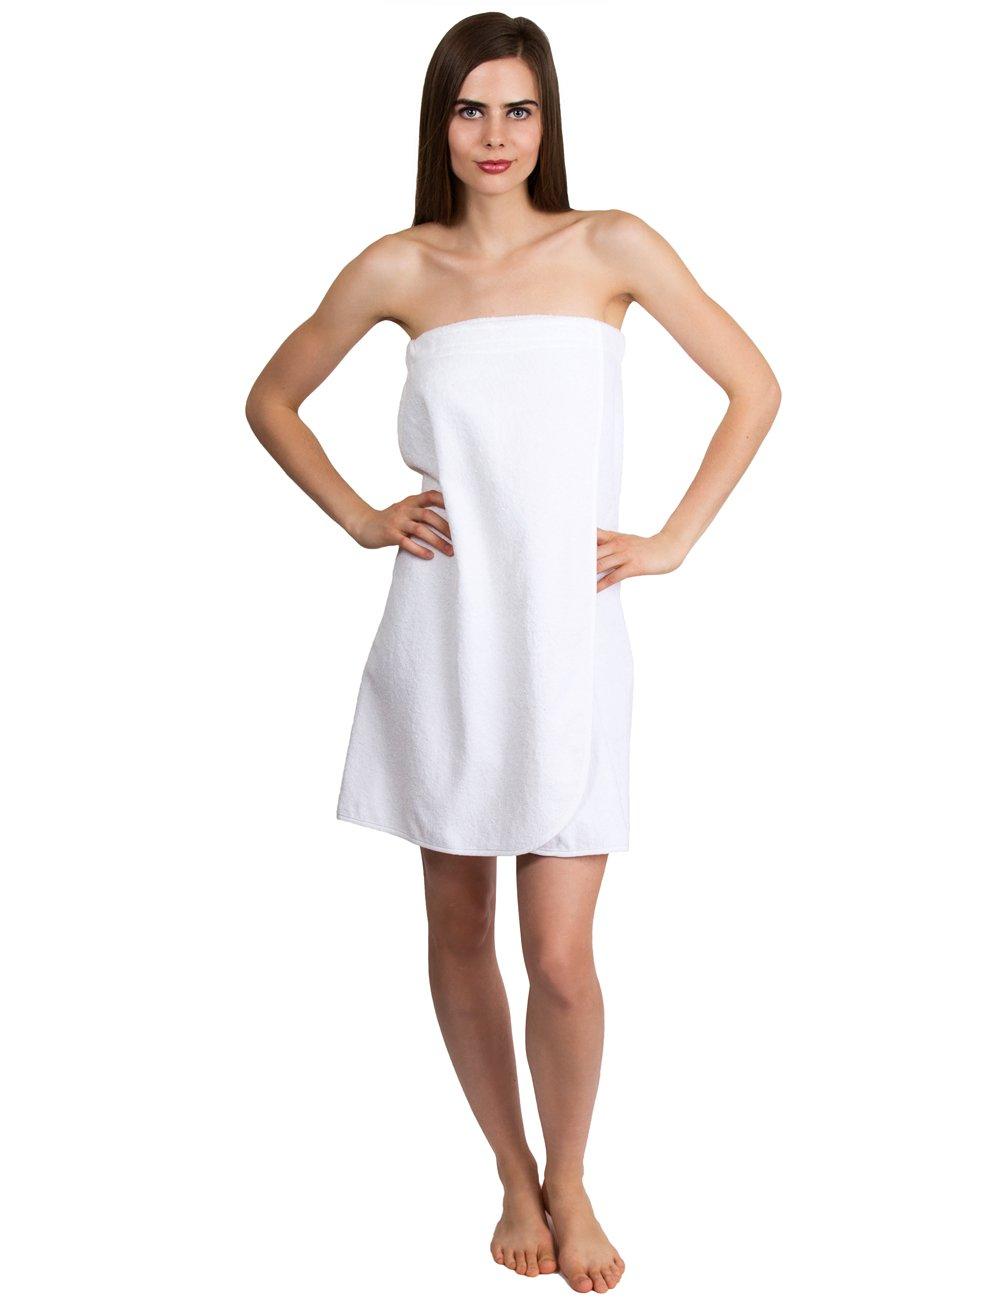 TowelSelections Women's Wrap, Shower & Bath, Terry Spa Towel Medium White